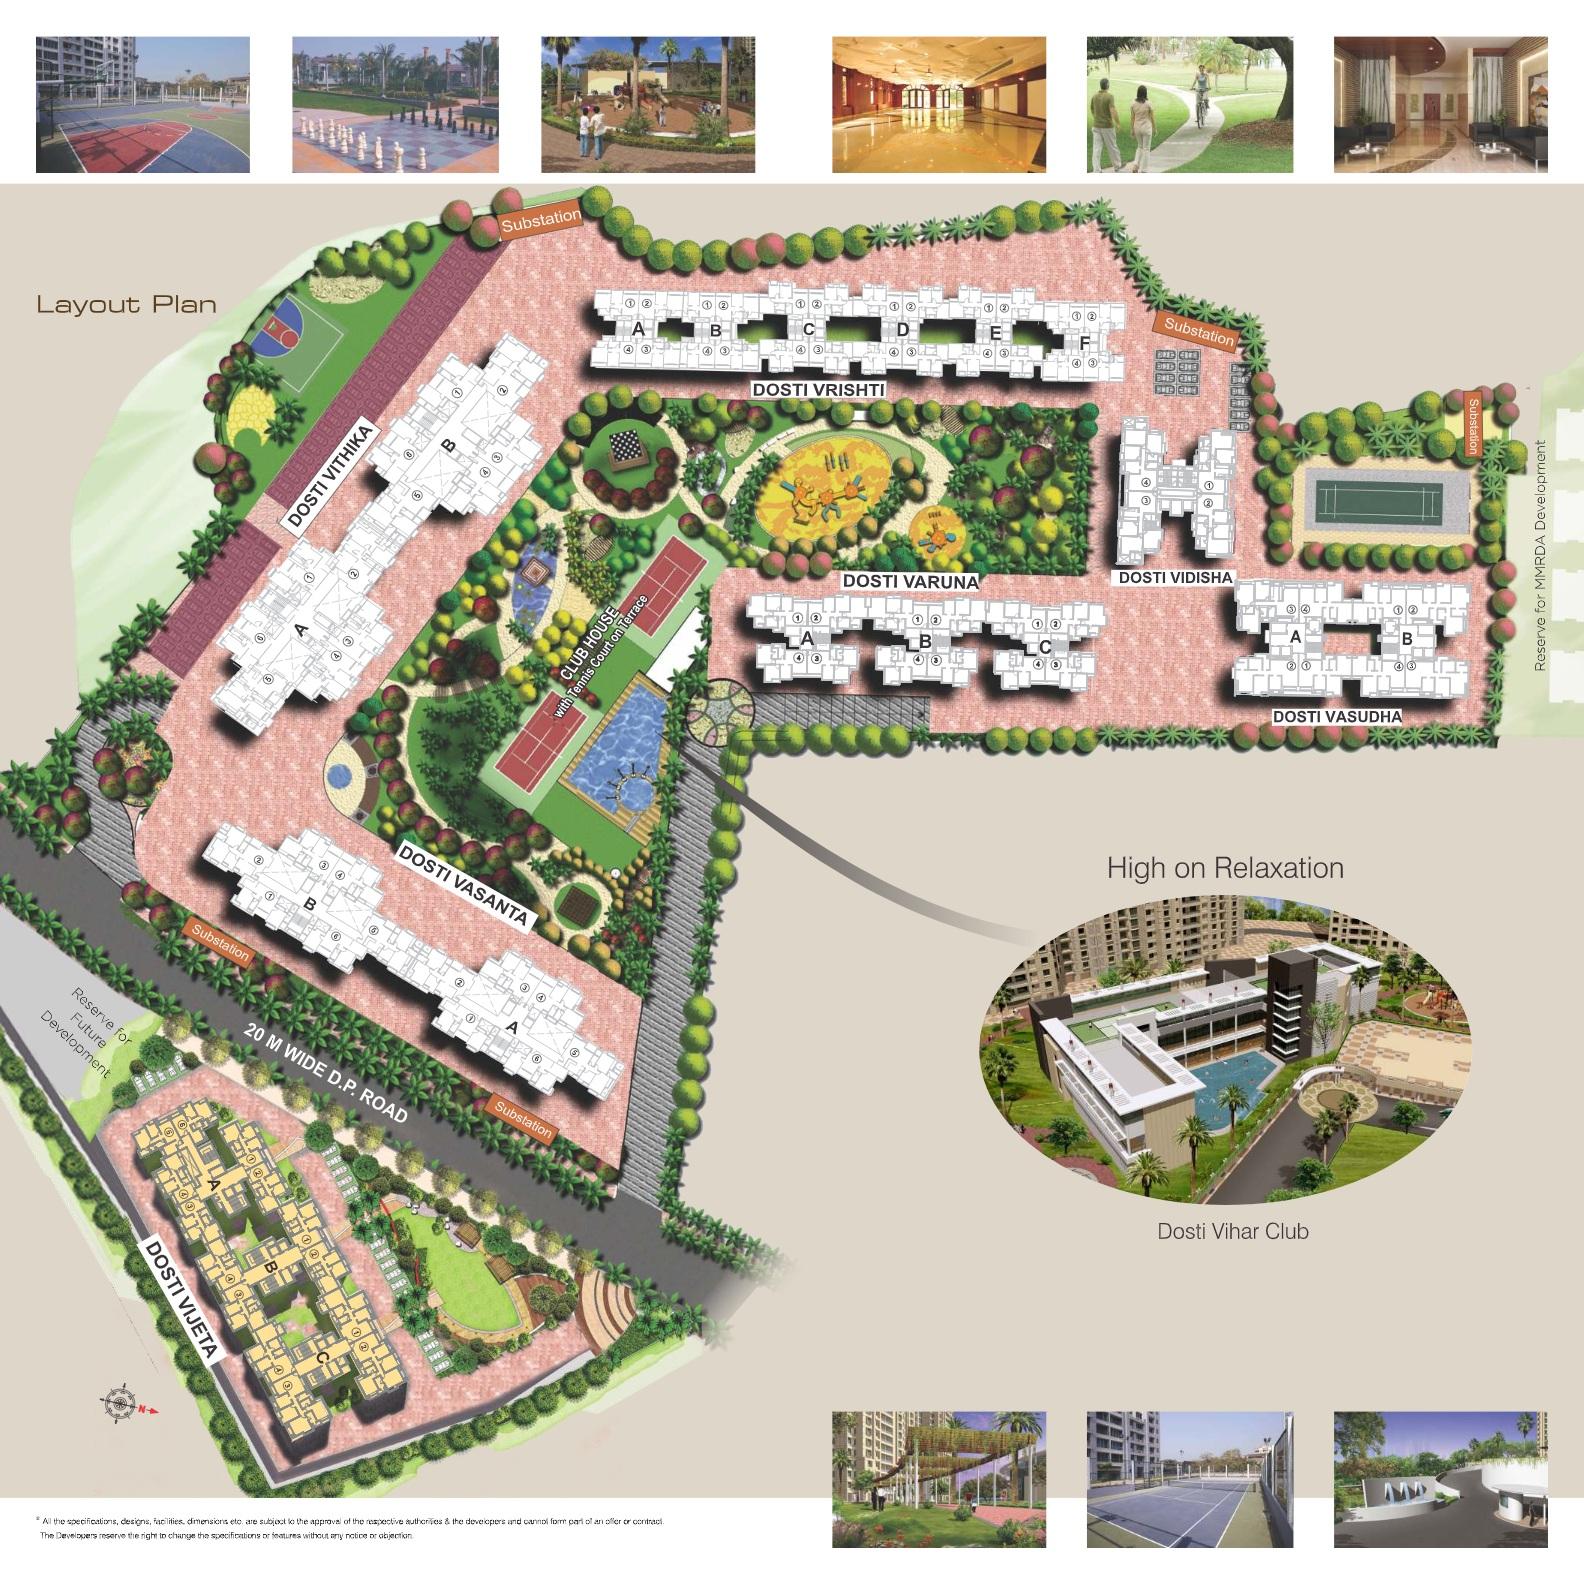 dosti vidisha project master plan image1